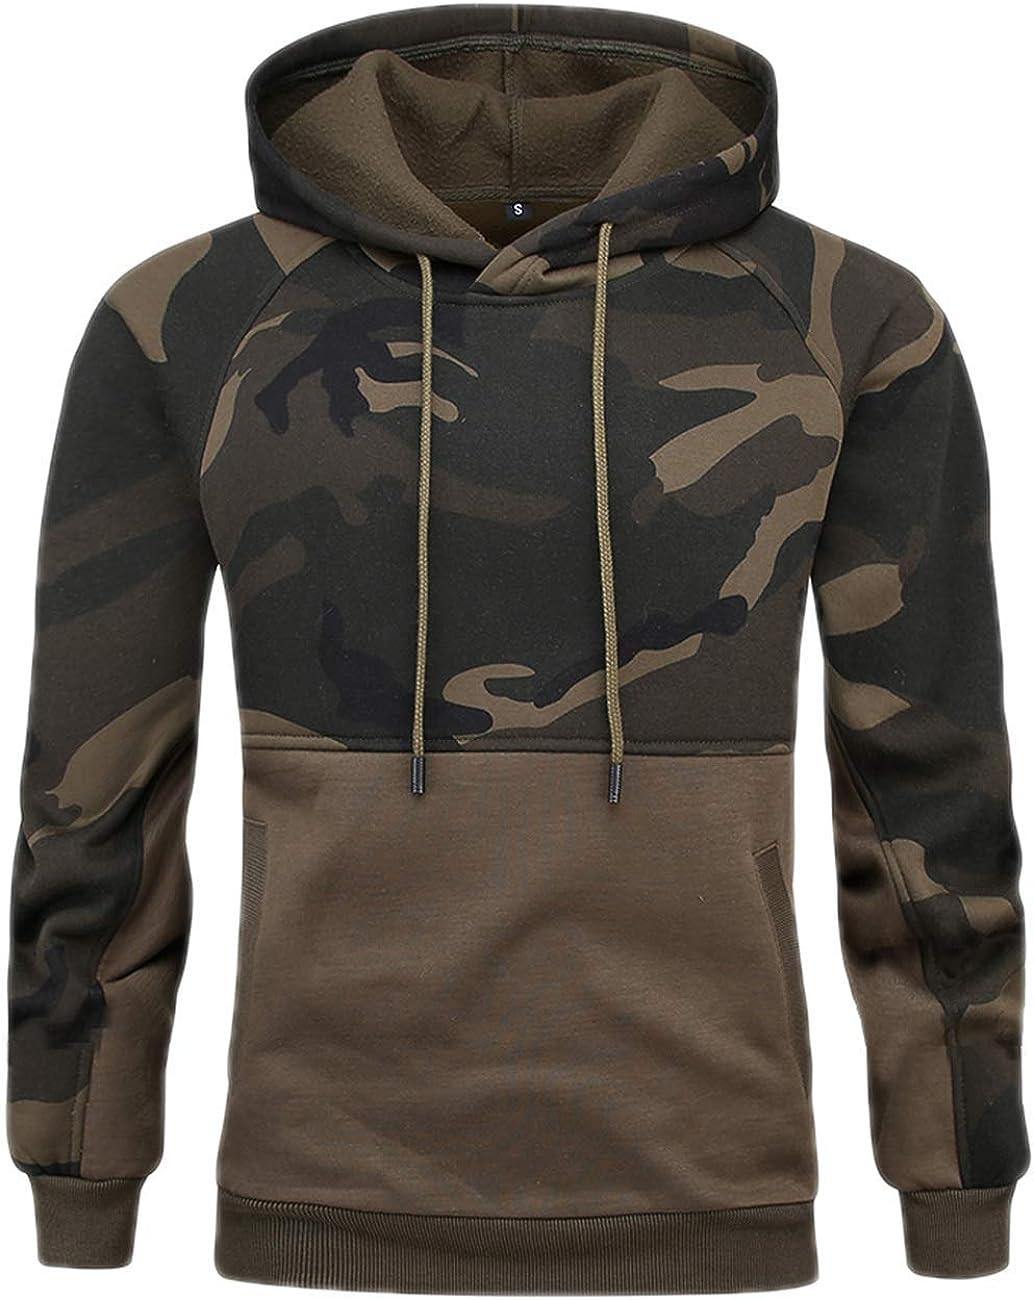 Novelty Color Block Pullover Fleece Unisex Couple Hoodie Long Sleeve Casual Sweatshirt with Pocket Camo Green